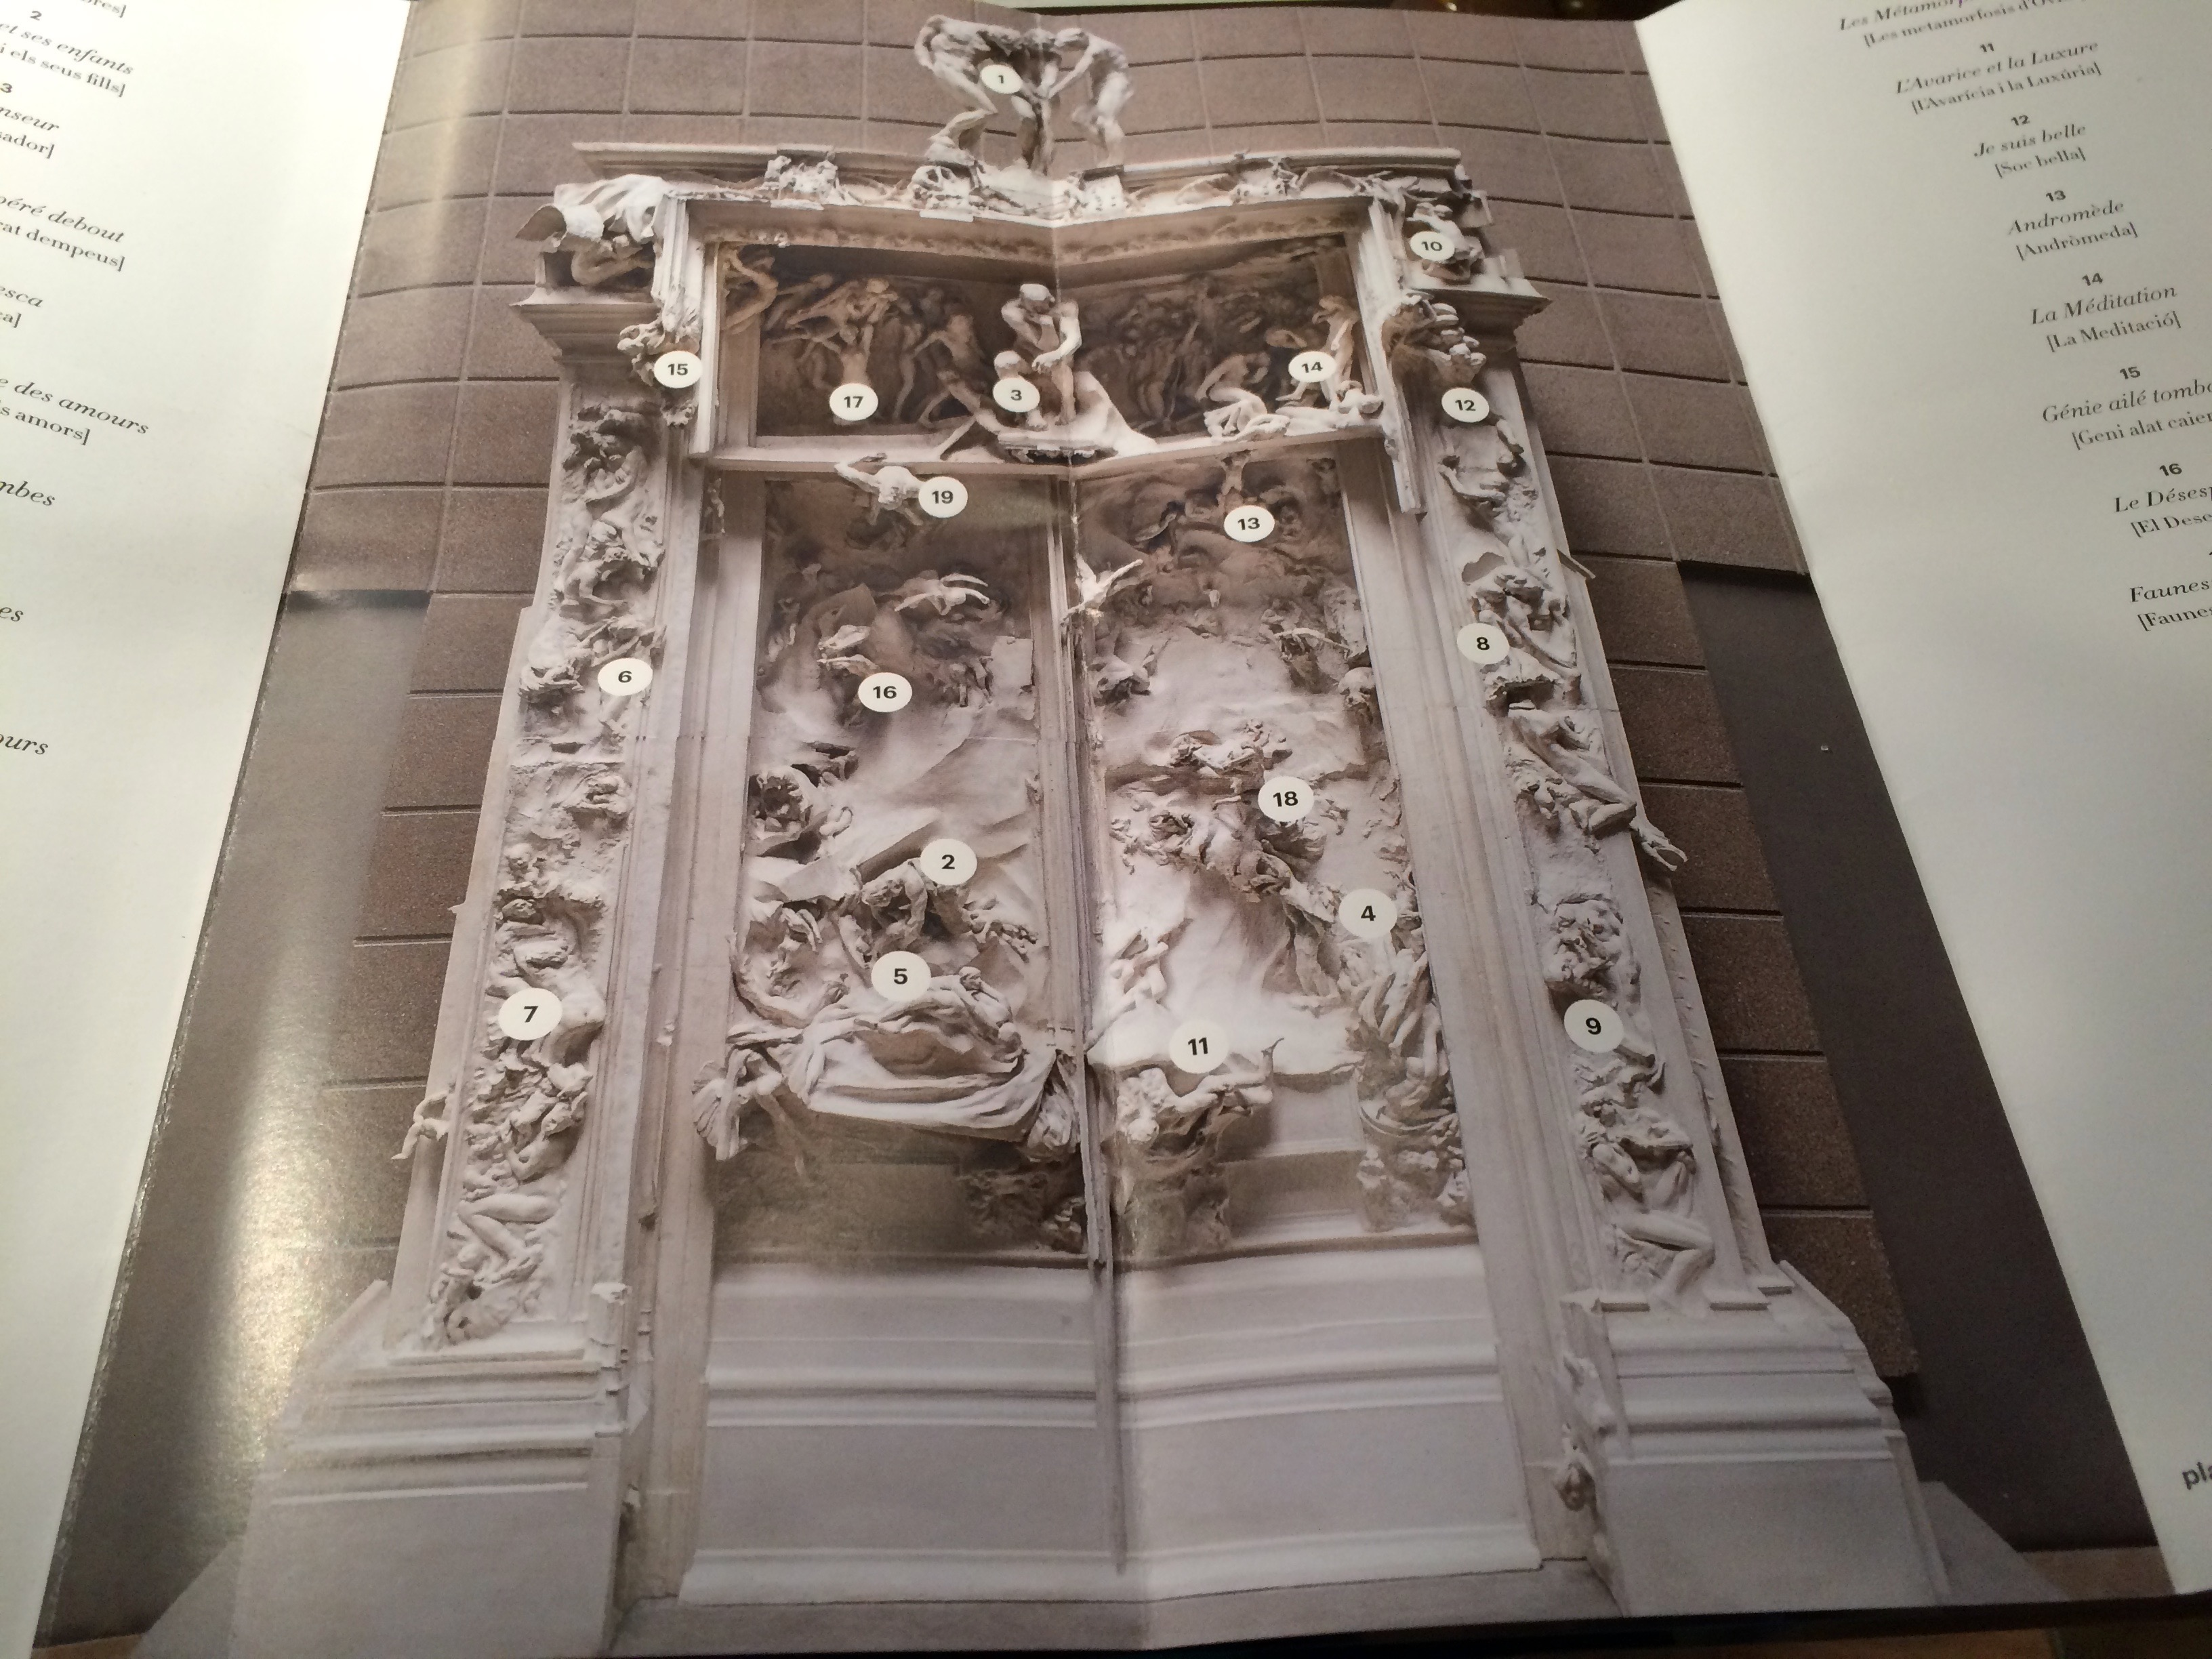 L'infern de Rodin. Fundación Mapfre. Programa de mà